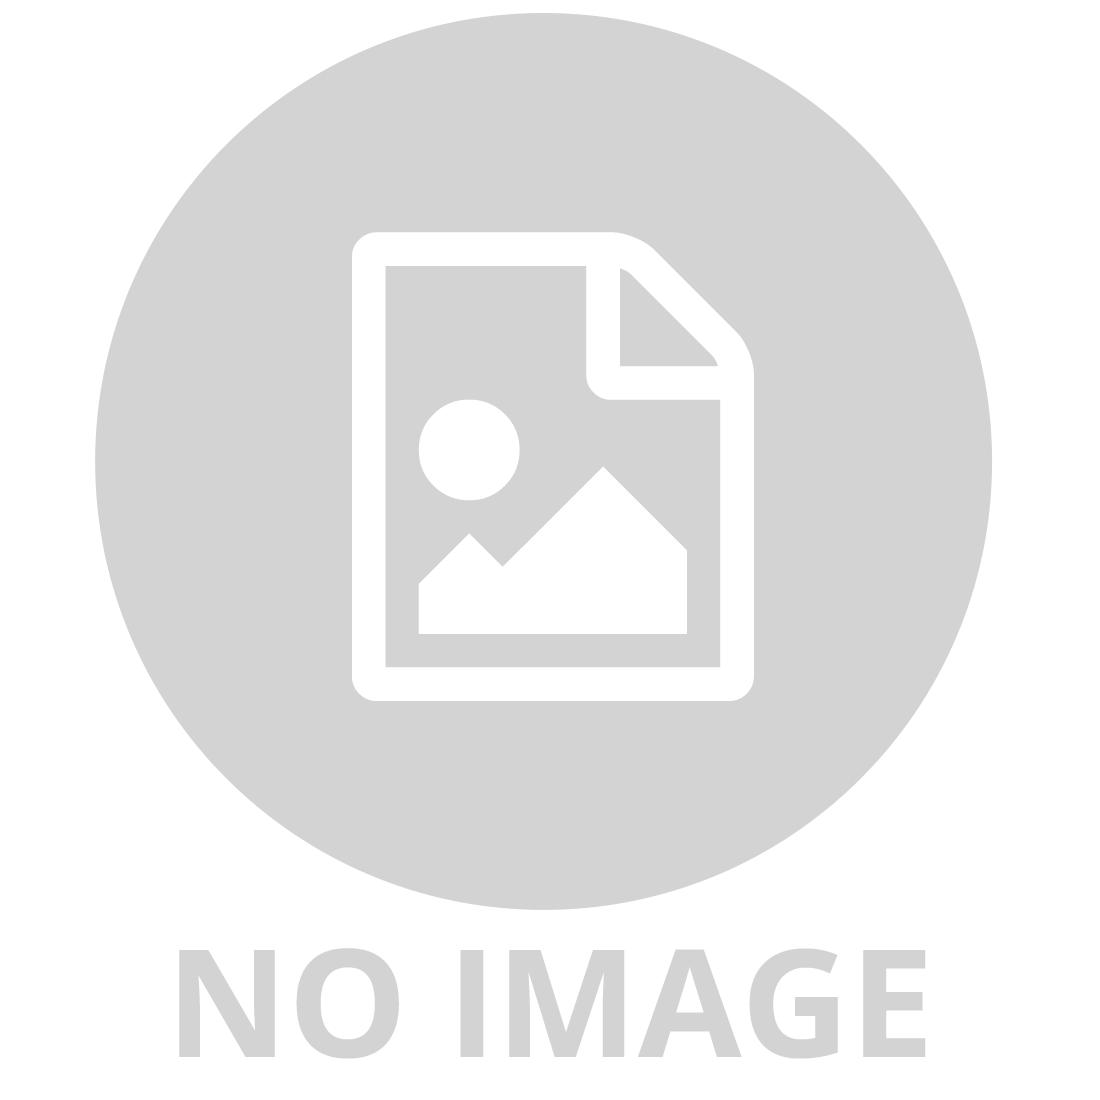 TAMIYA TS 84 METALIC GOLD SPRAY PAINT FOR PLASTICS